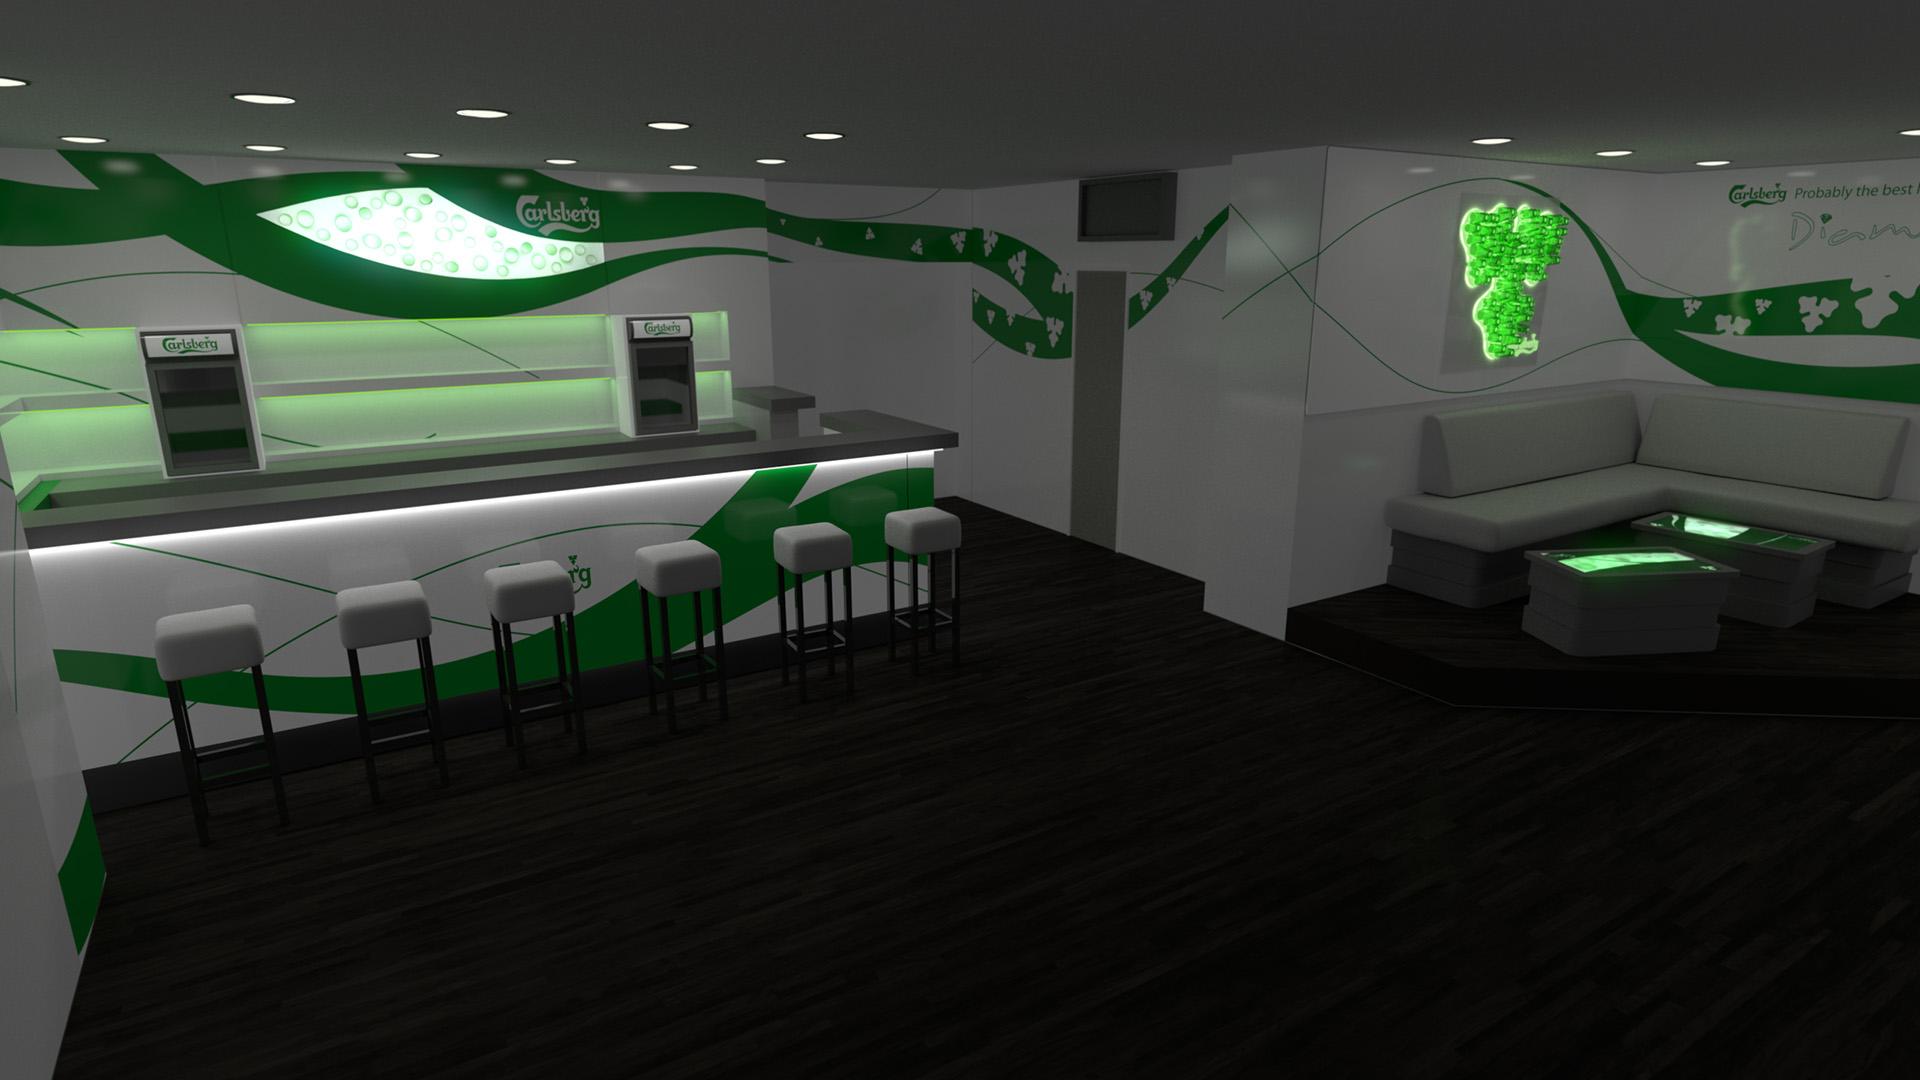 carlsberg,rendering,3d rendering,interior design,glas design,club,diamond, köln